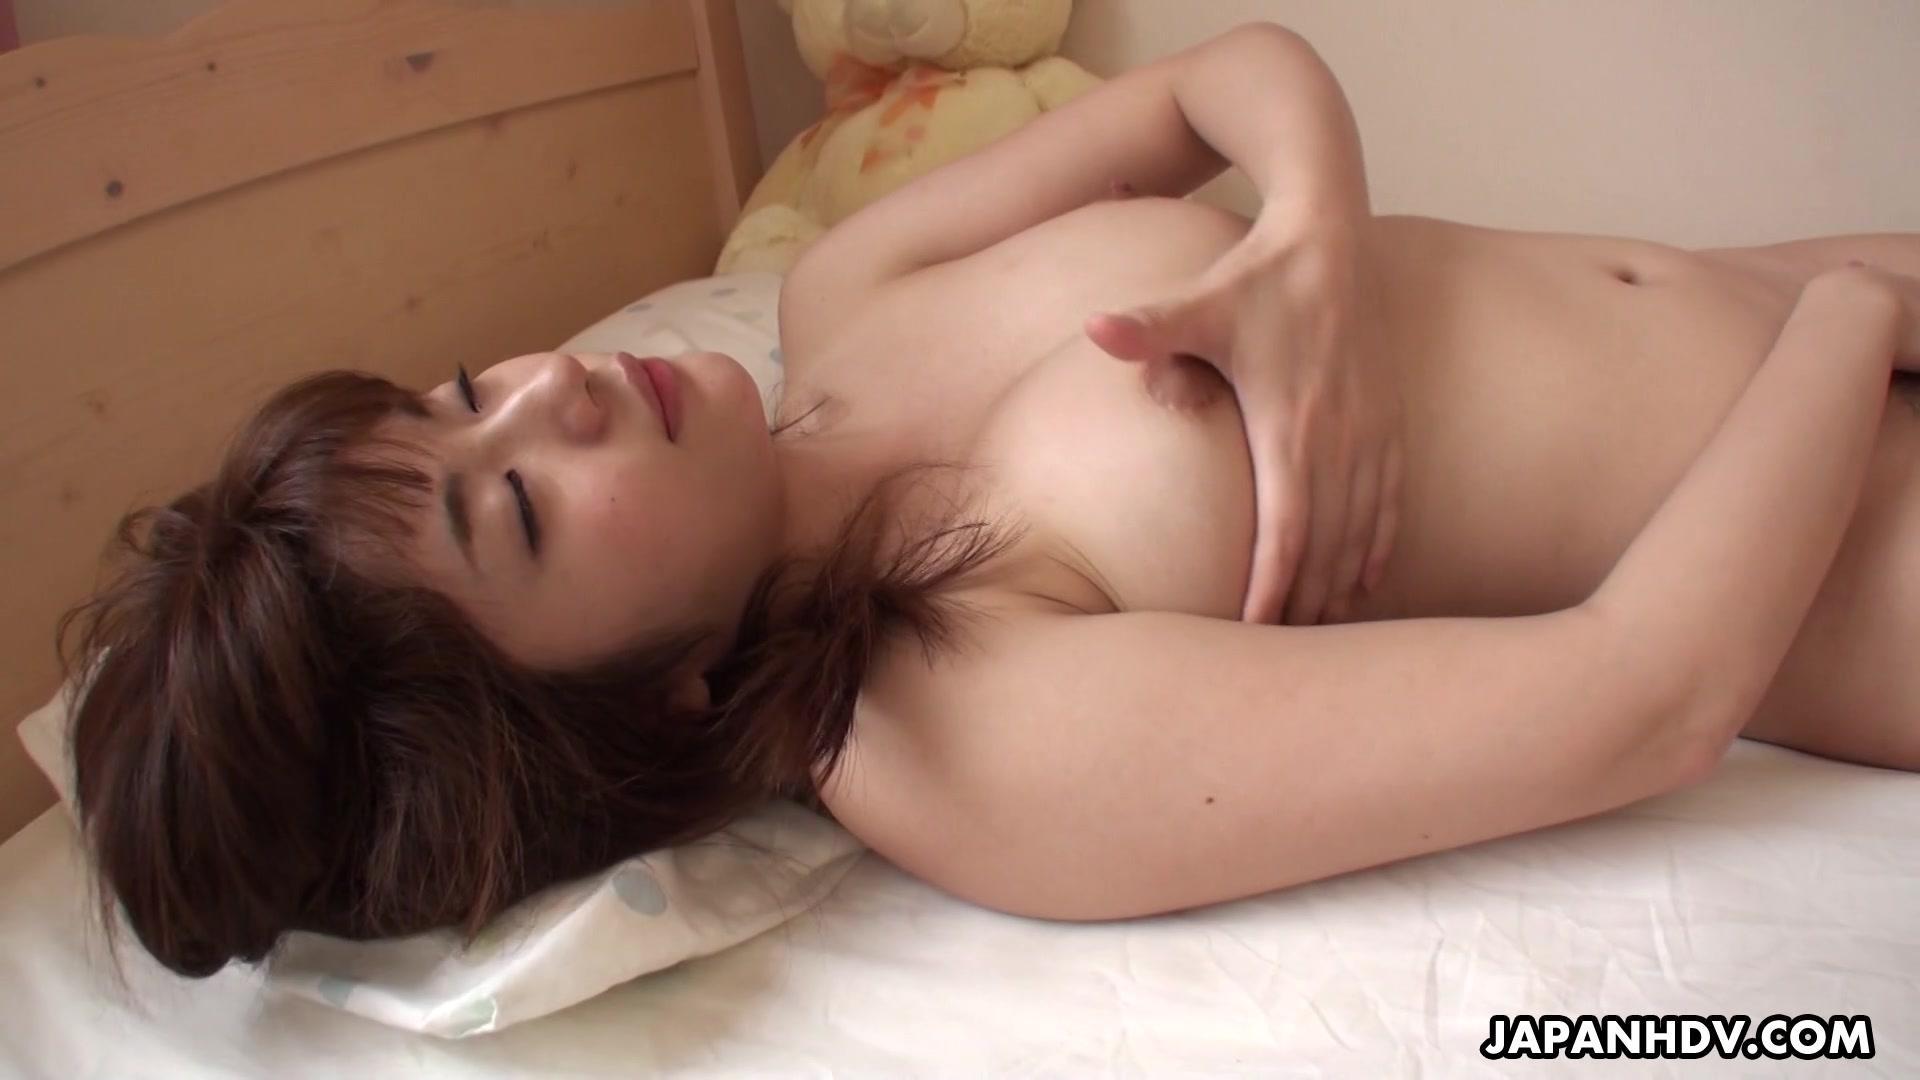 Japan HDV – Mai Misato